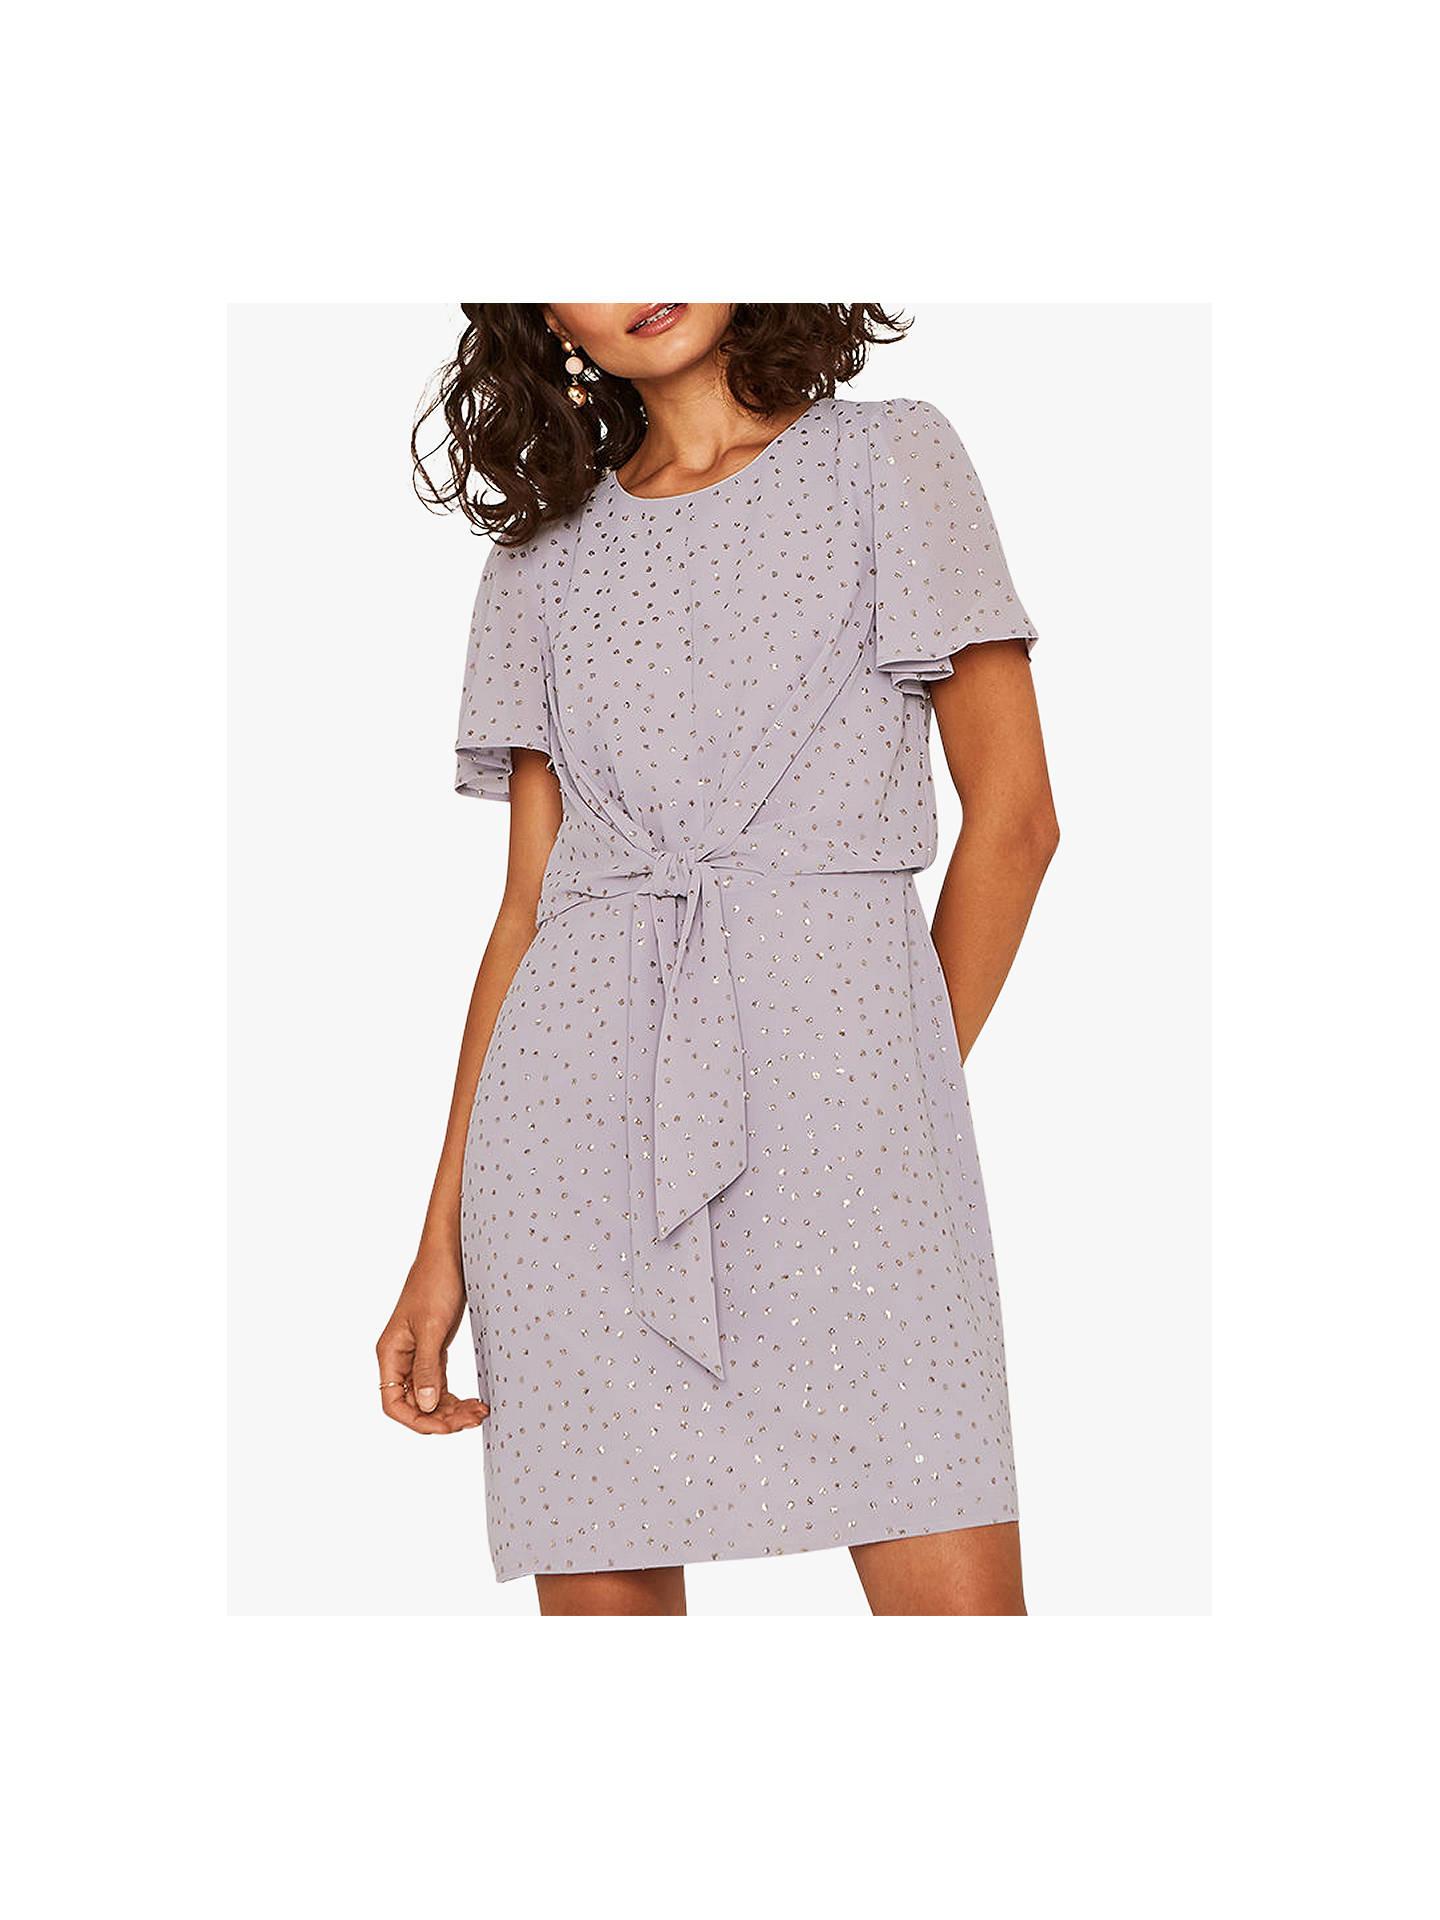 3c6b4501 Buy Oasis Glitter Spot Tie Dress, Lilac, 16 Online at johnlewis.com ...